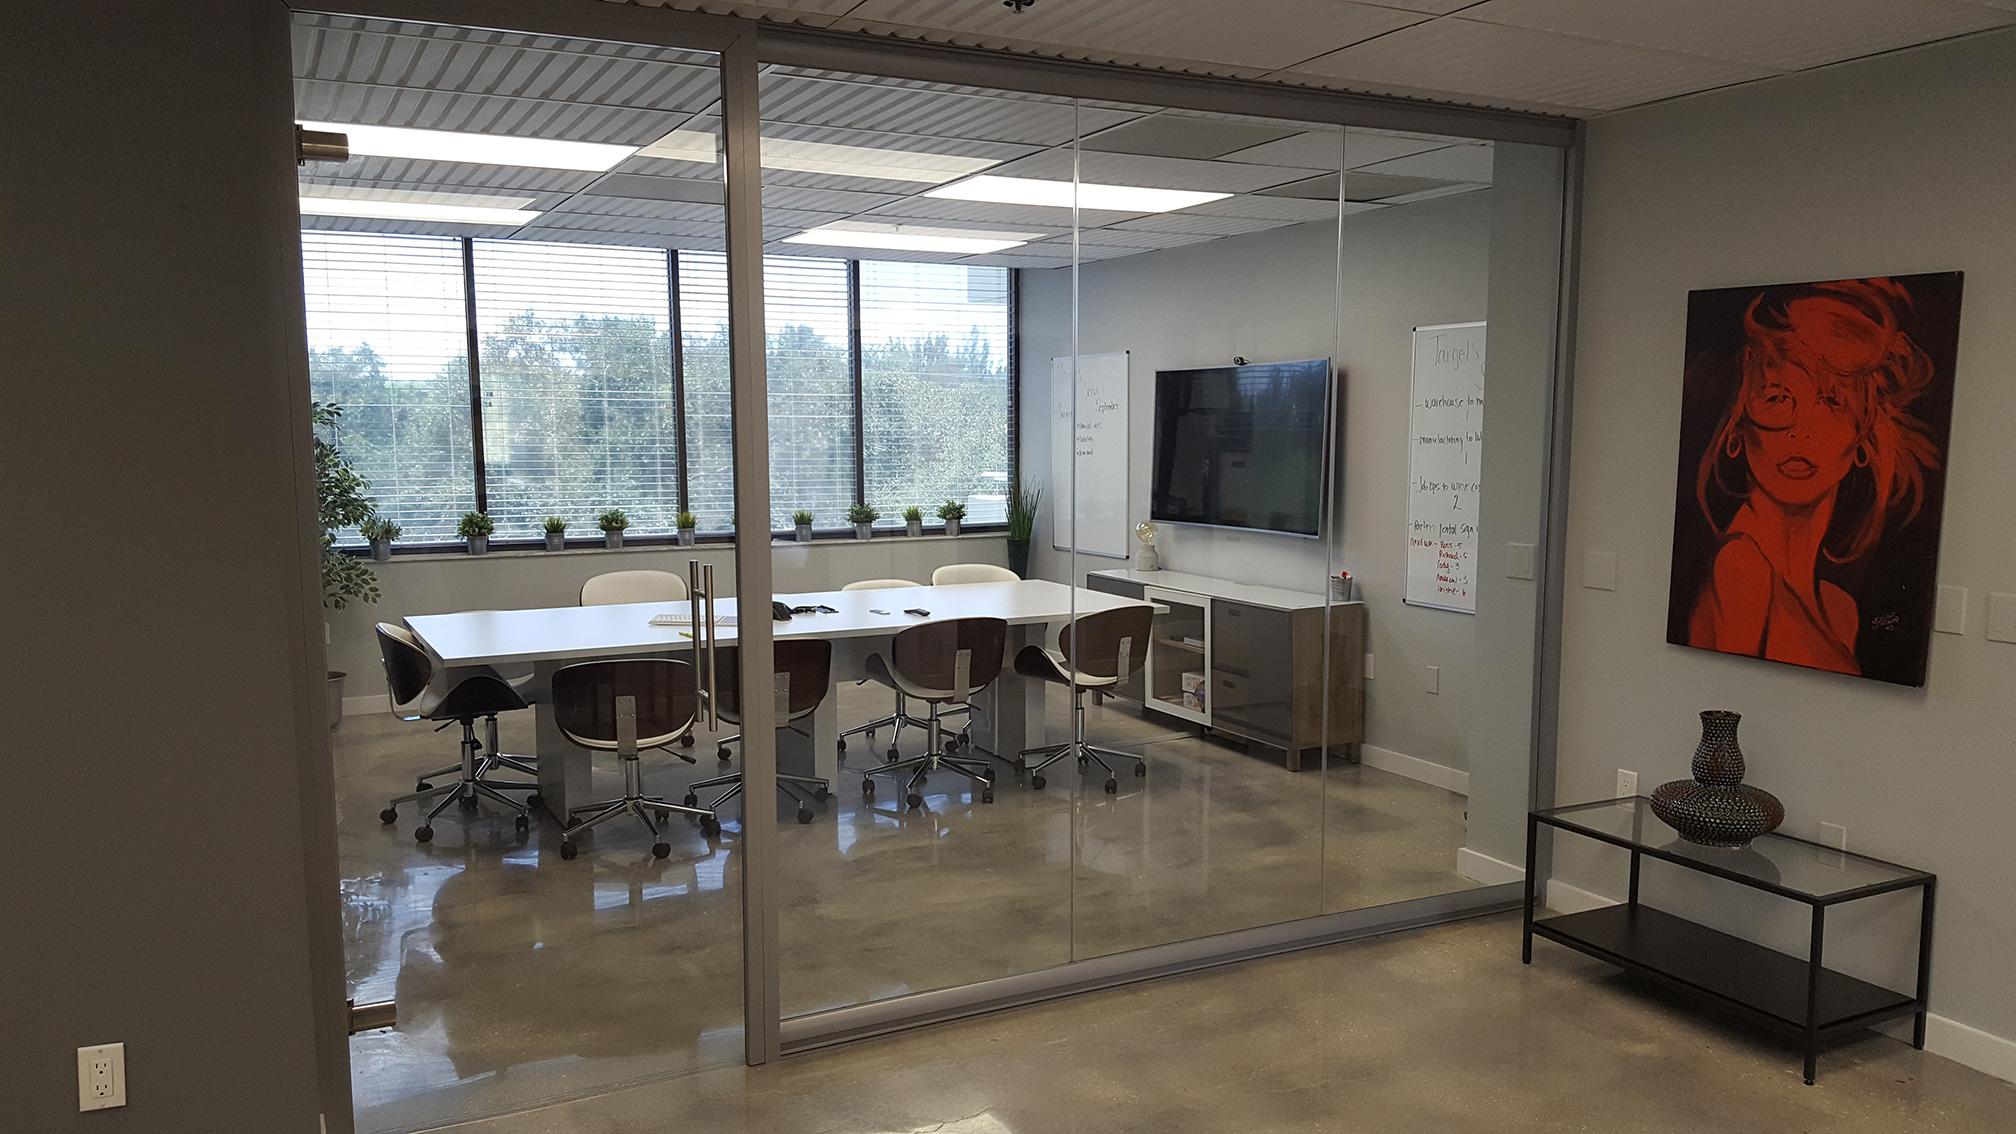 furniture-office-supplies-in-fruitland-park-florida-5.jpg